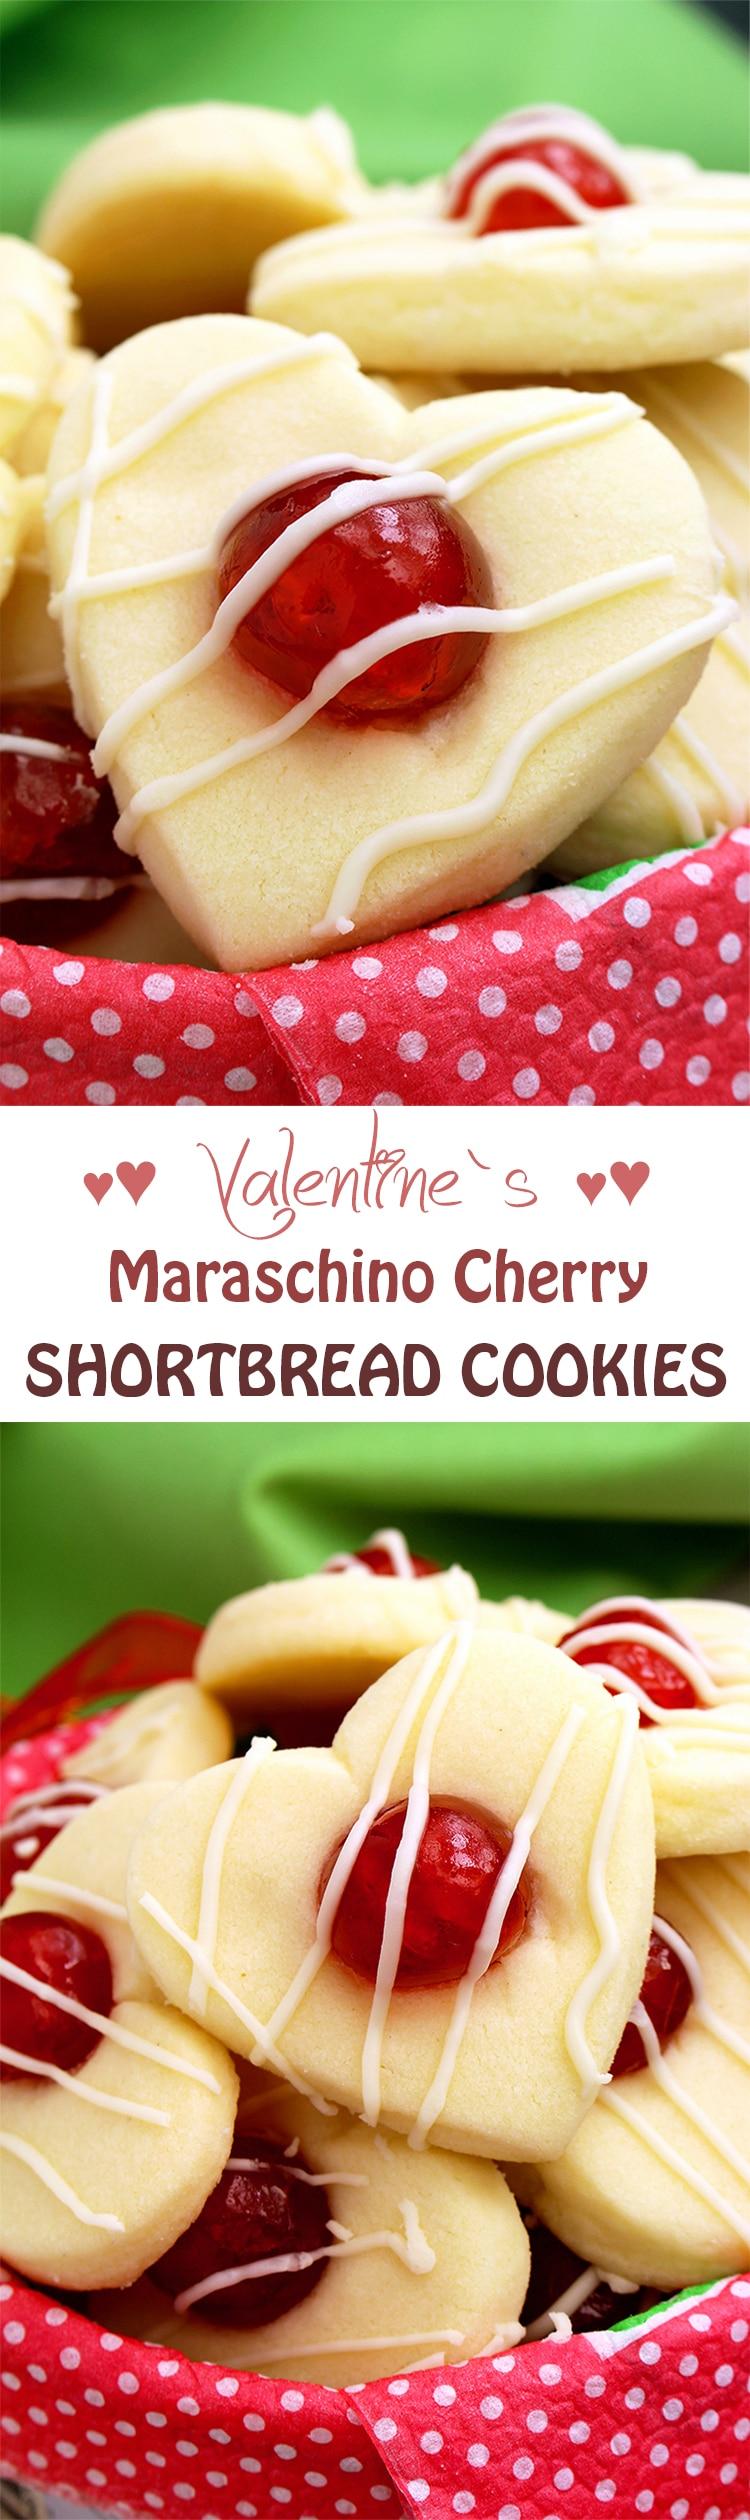 Untitled-150 Valentine's Maraschino Cherry Shortbread Cookies